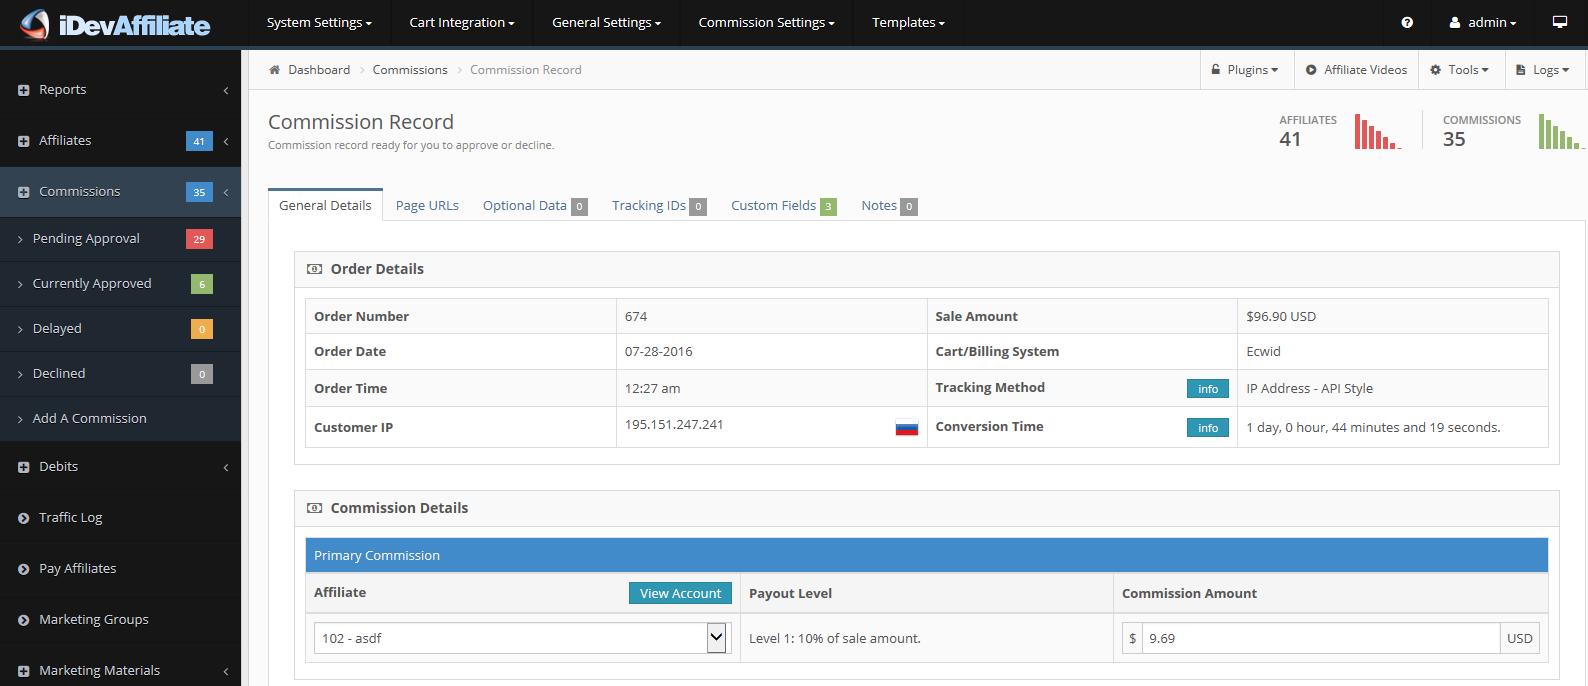 Dating affiliate software door iDevAffiliate